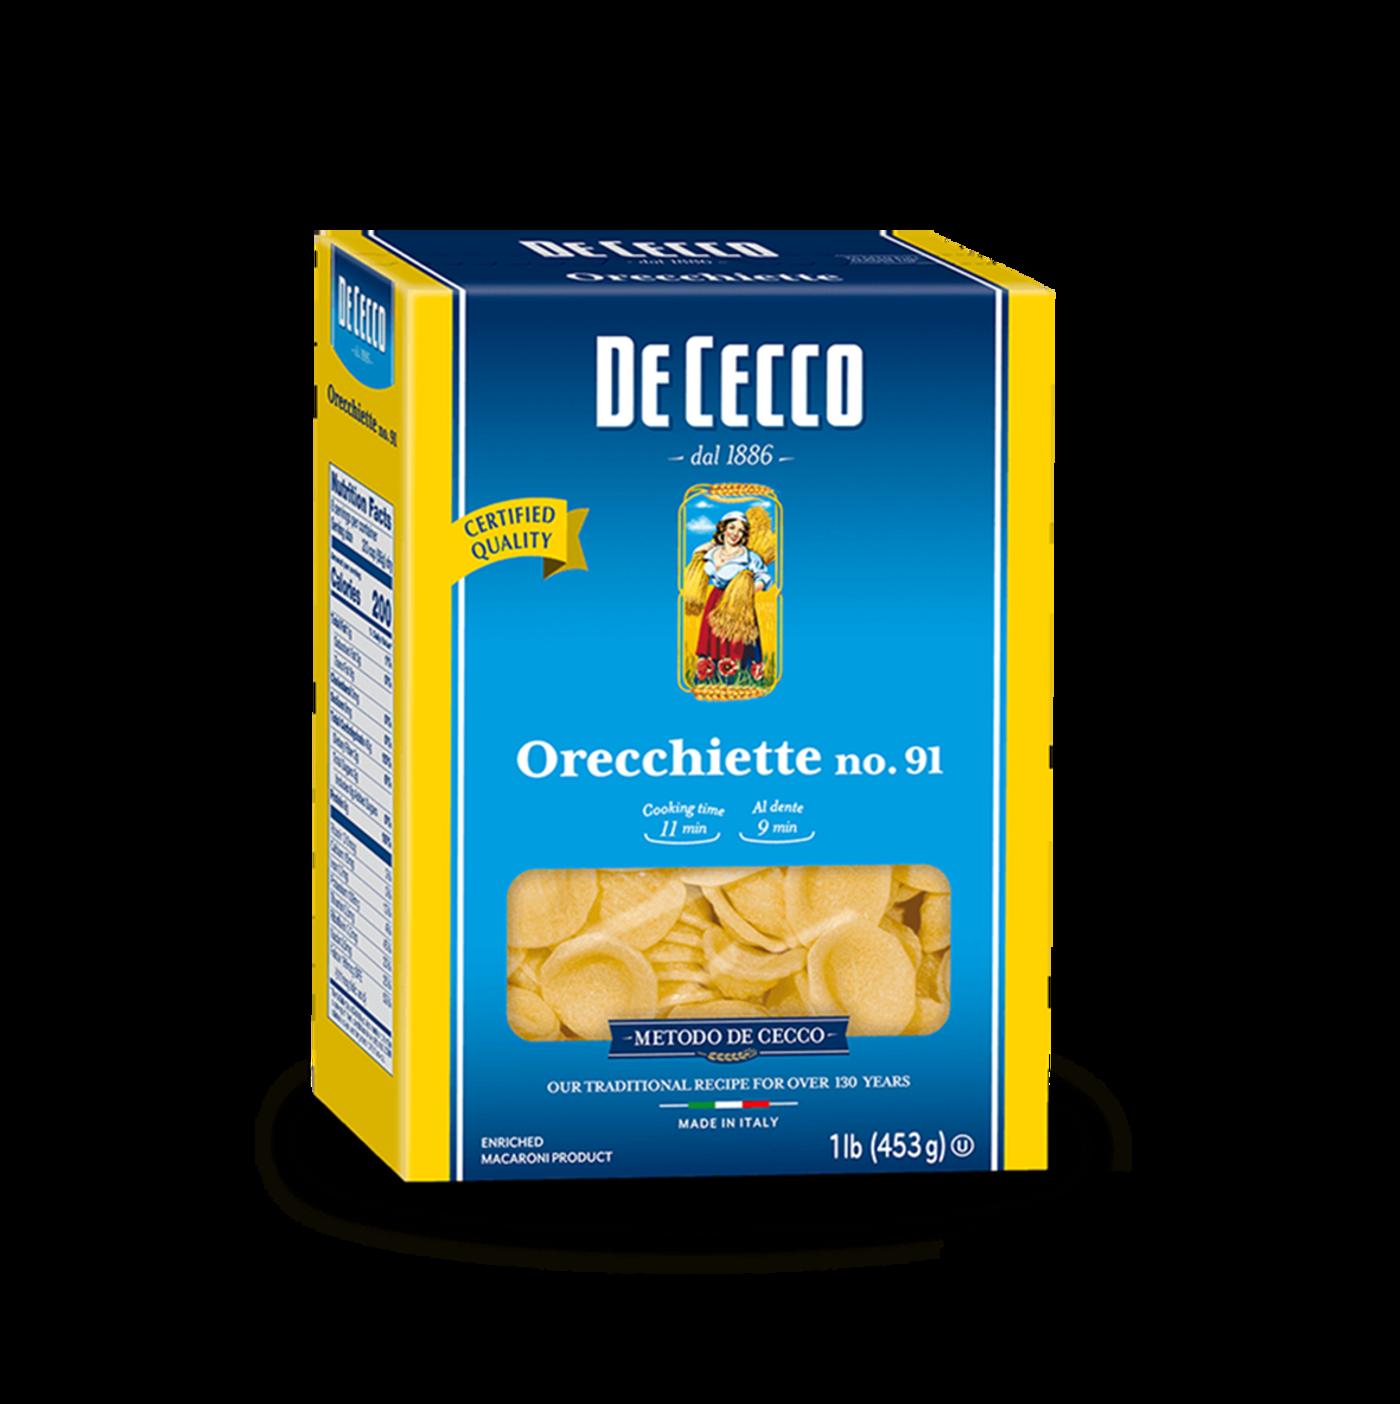 Orecchiette N.91